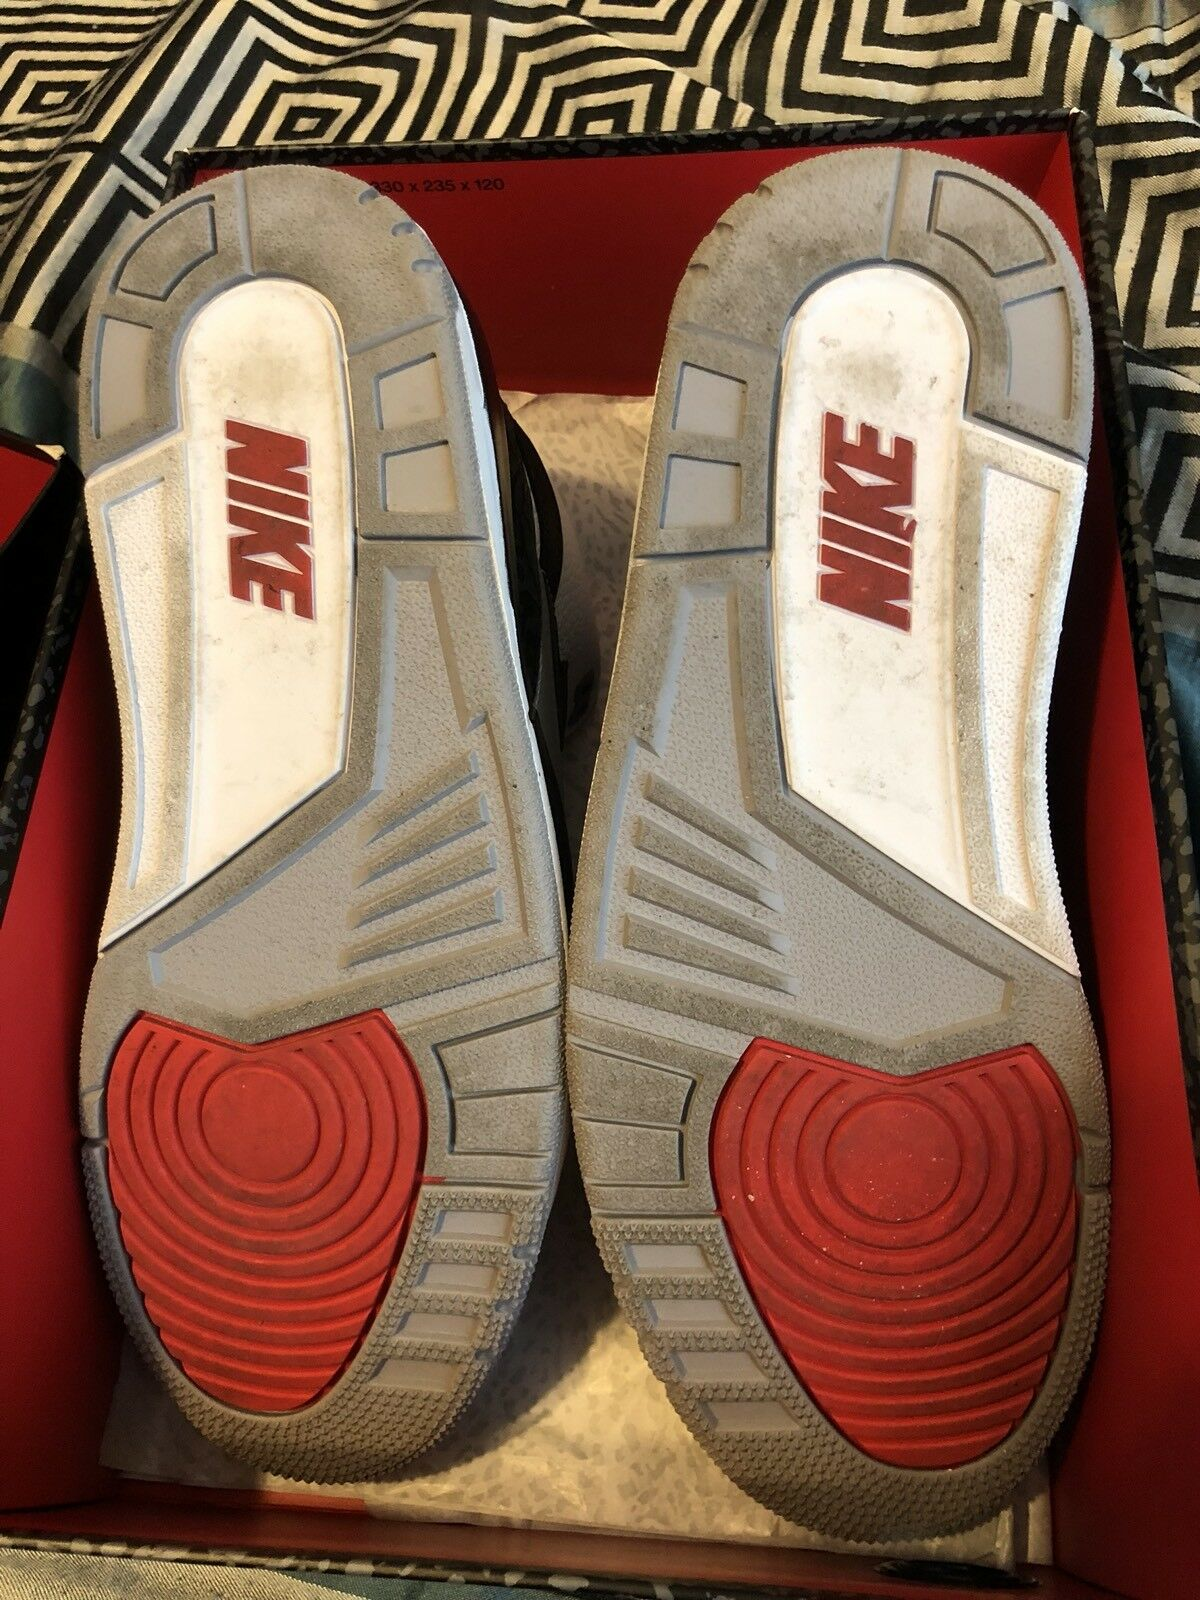 Nike air jordan 3 tinker tinker tinker hatfield iii nrg retro, retro -  9. 41b59b